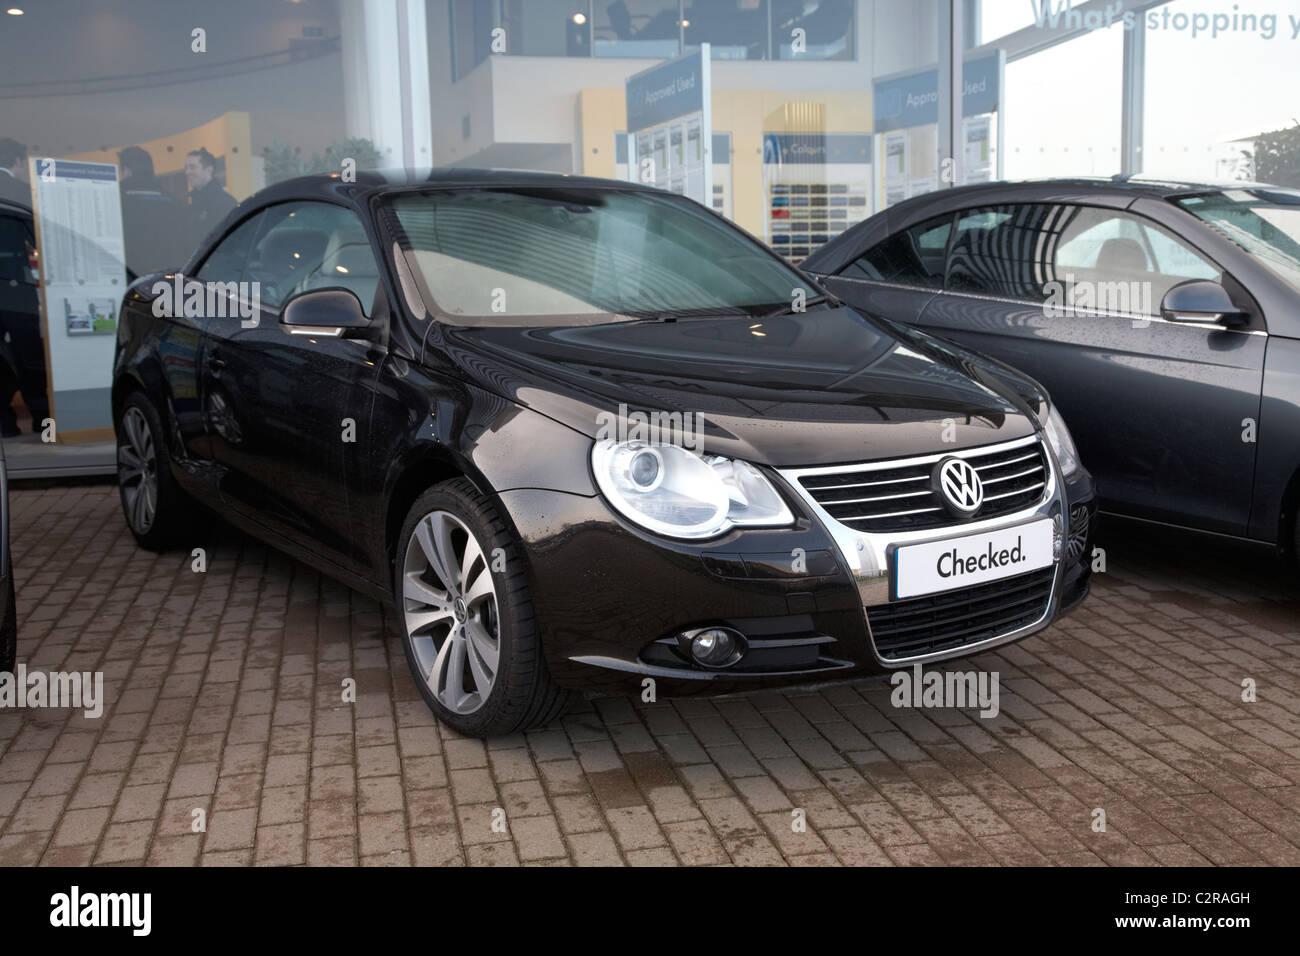 company scirocco morgans essex car used big volkswagen limited in cars